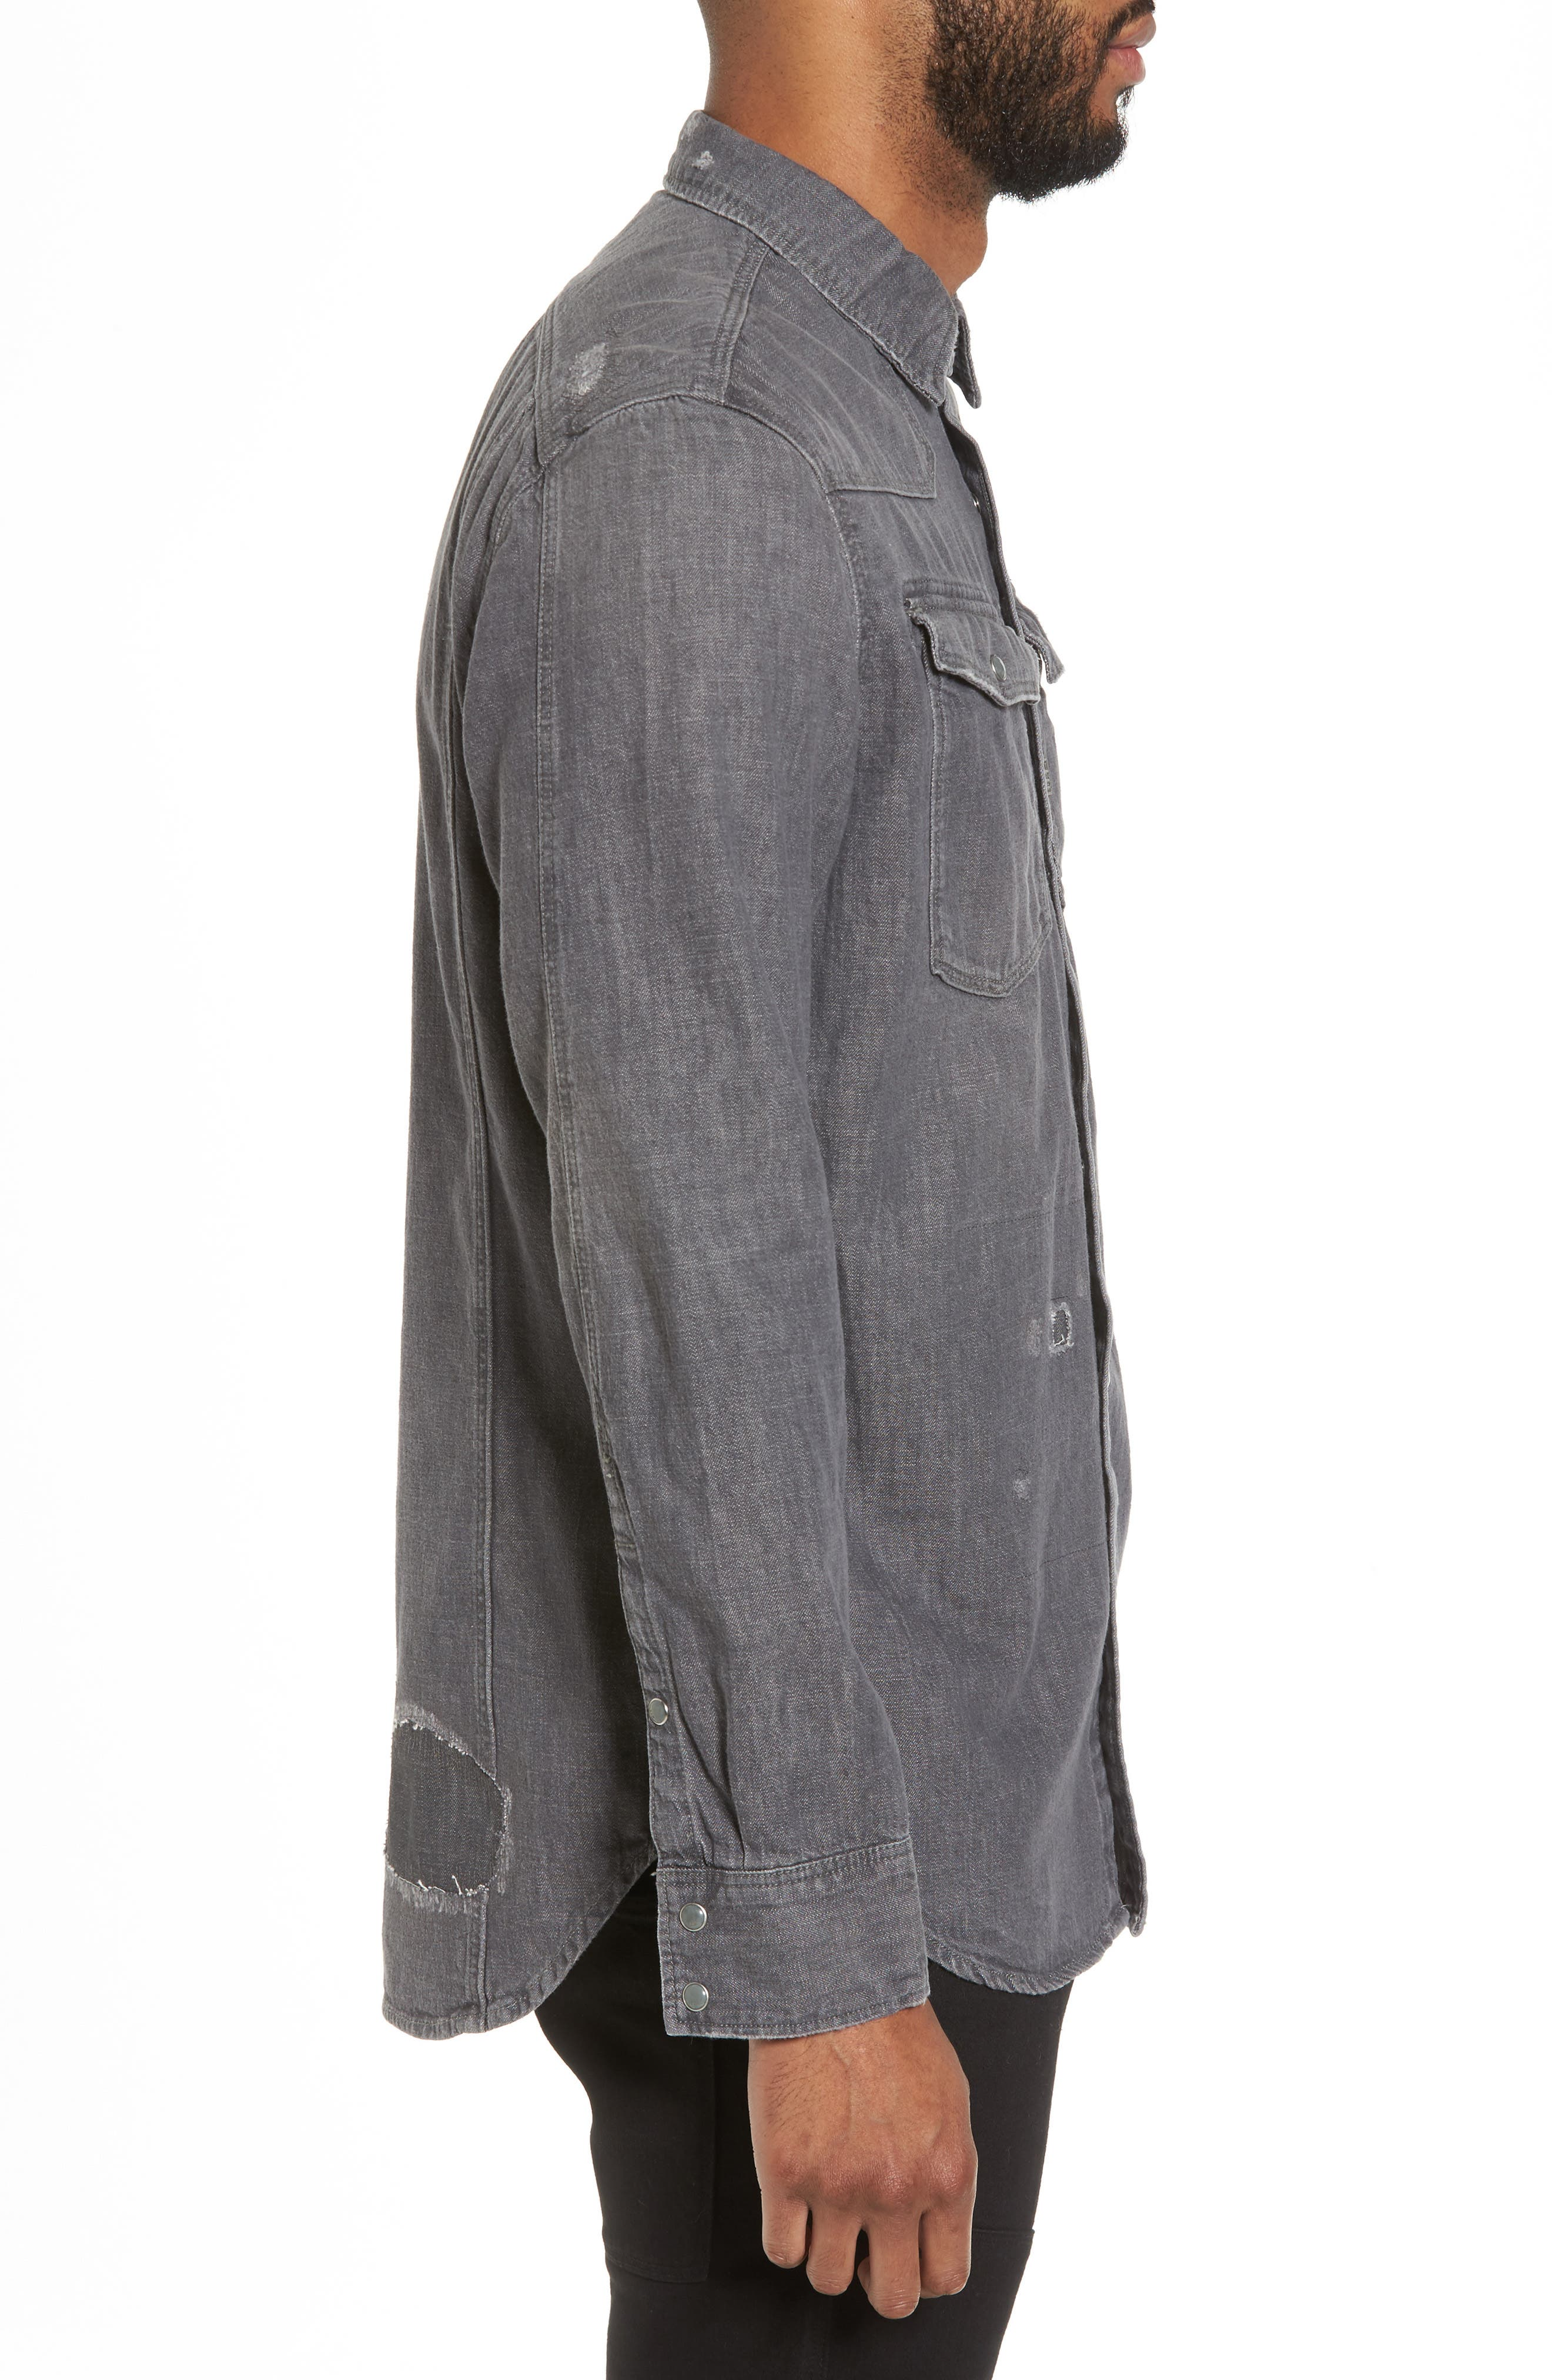 3301 Craser Denim Shirt,                             Alternate thumbnail 3, color,                             025